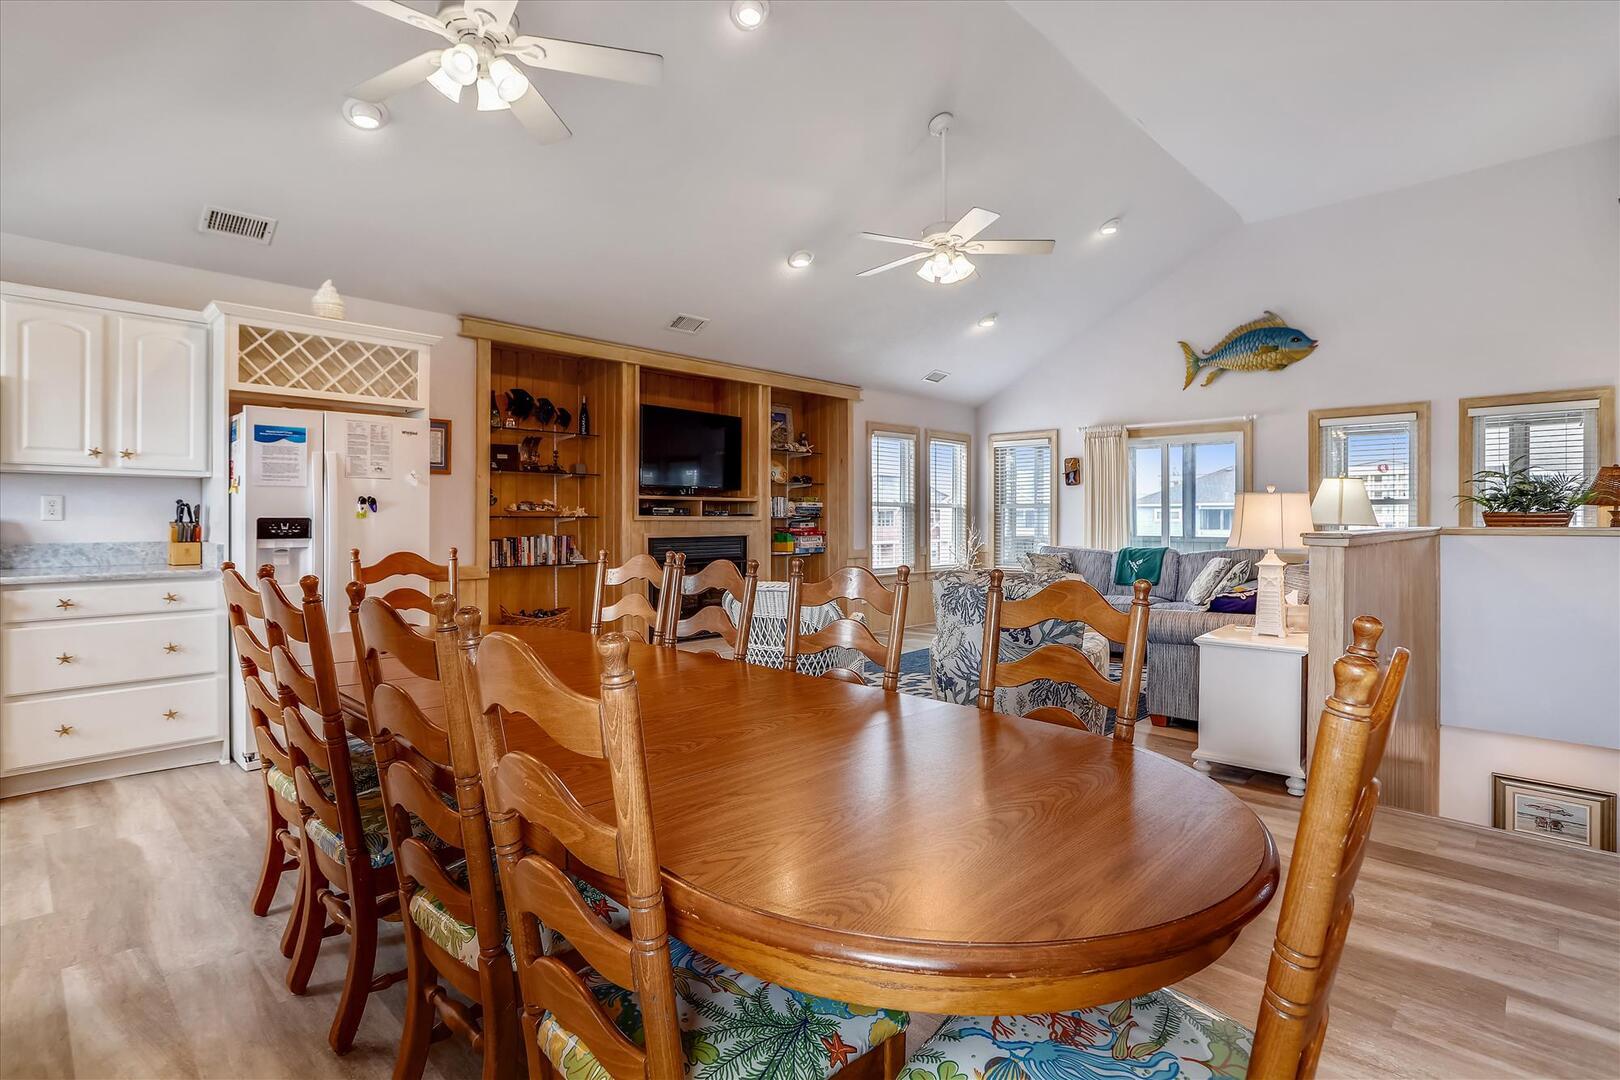 Upper/Main Level,Dining Area,